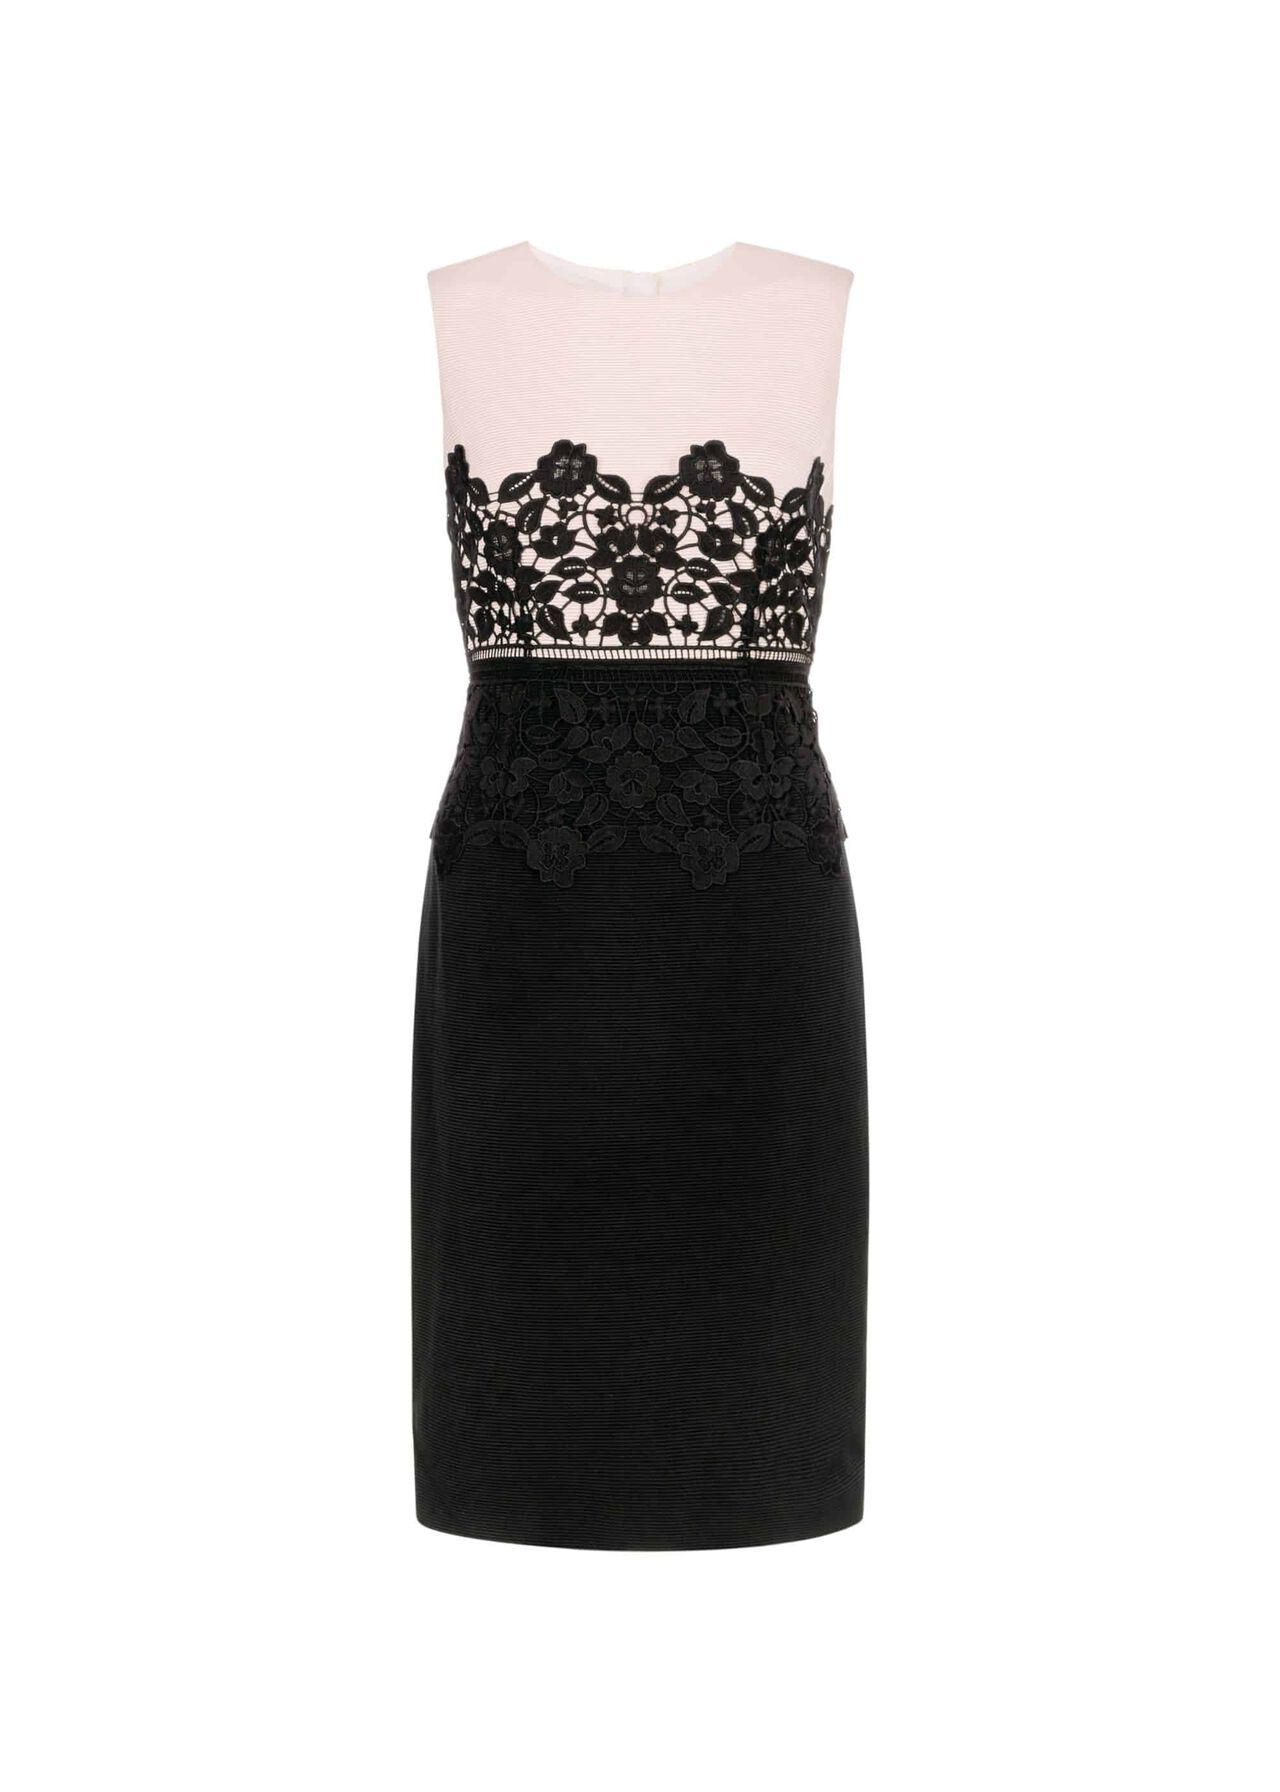 Seraphina Dress Pink Black